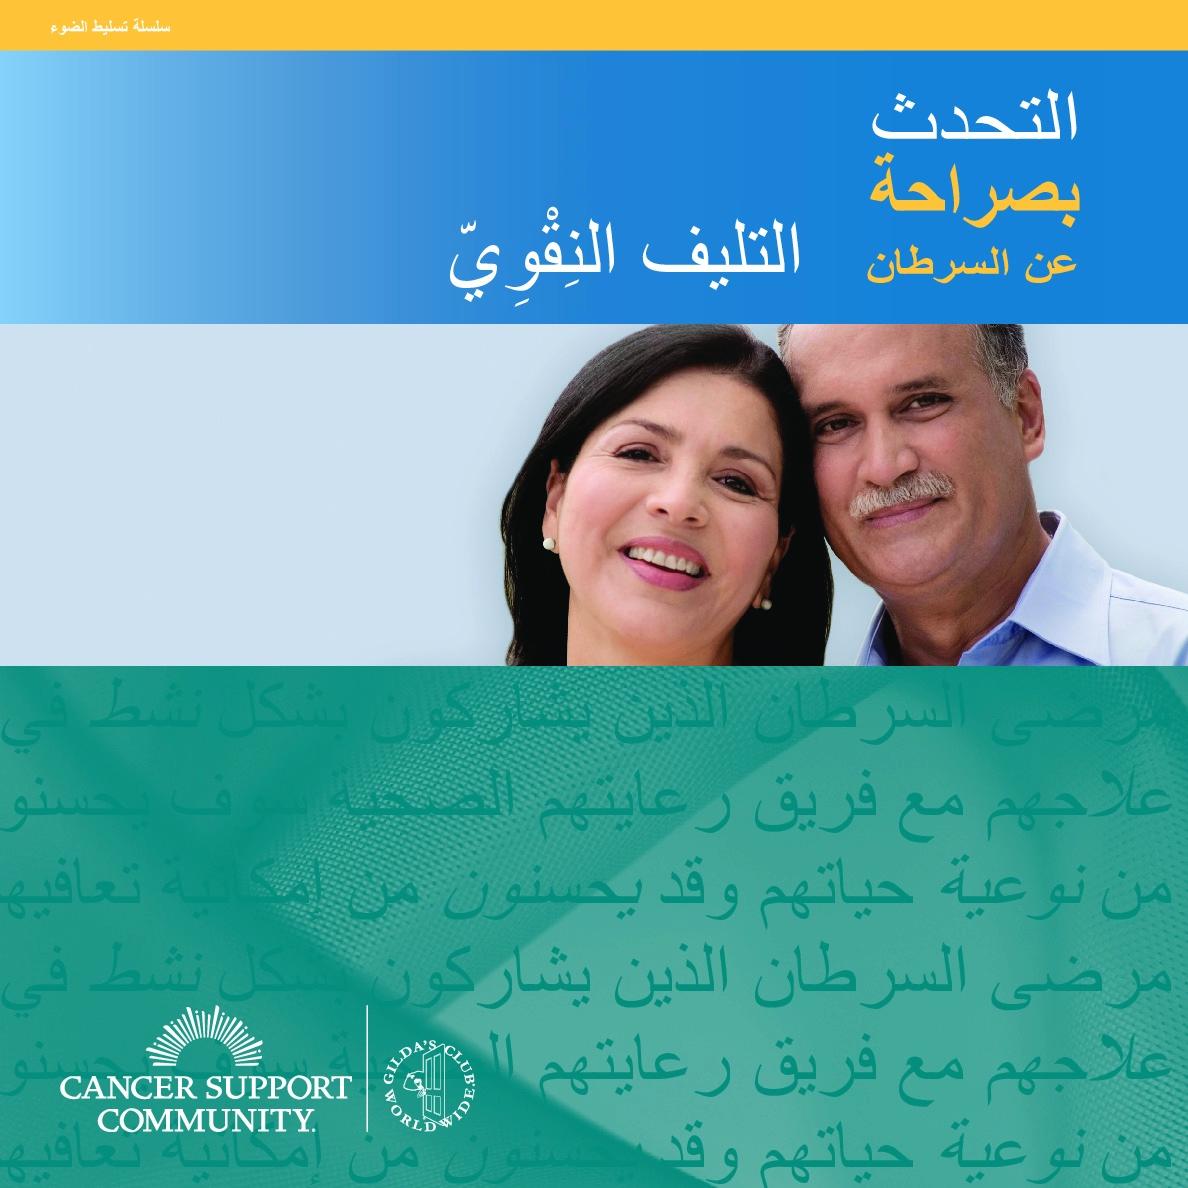 Myelofibrosis (Arabic)